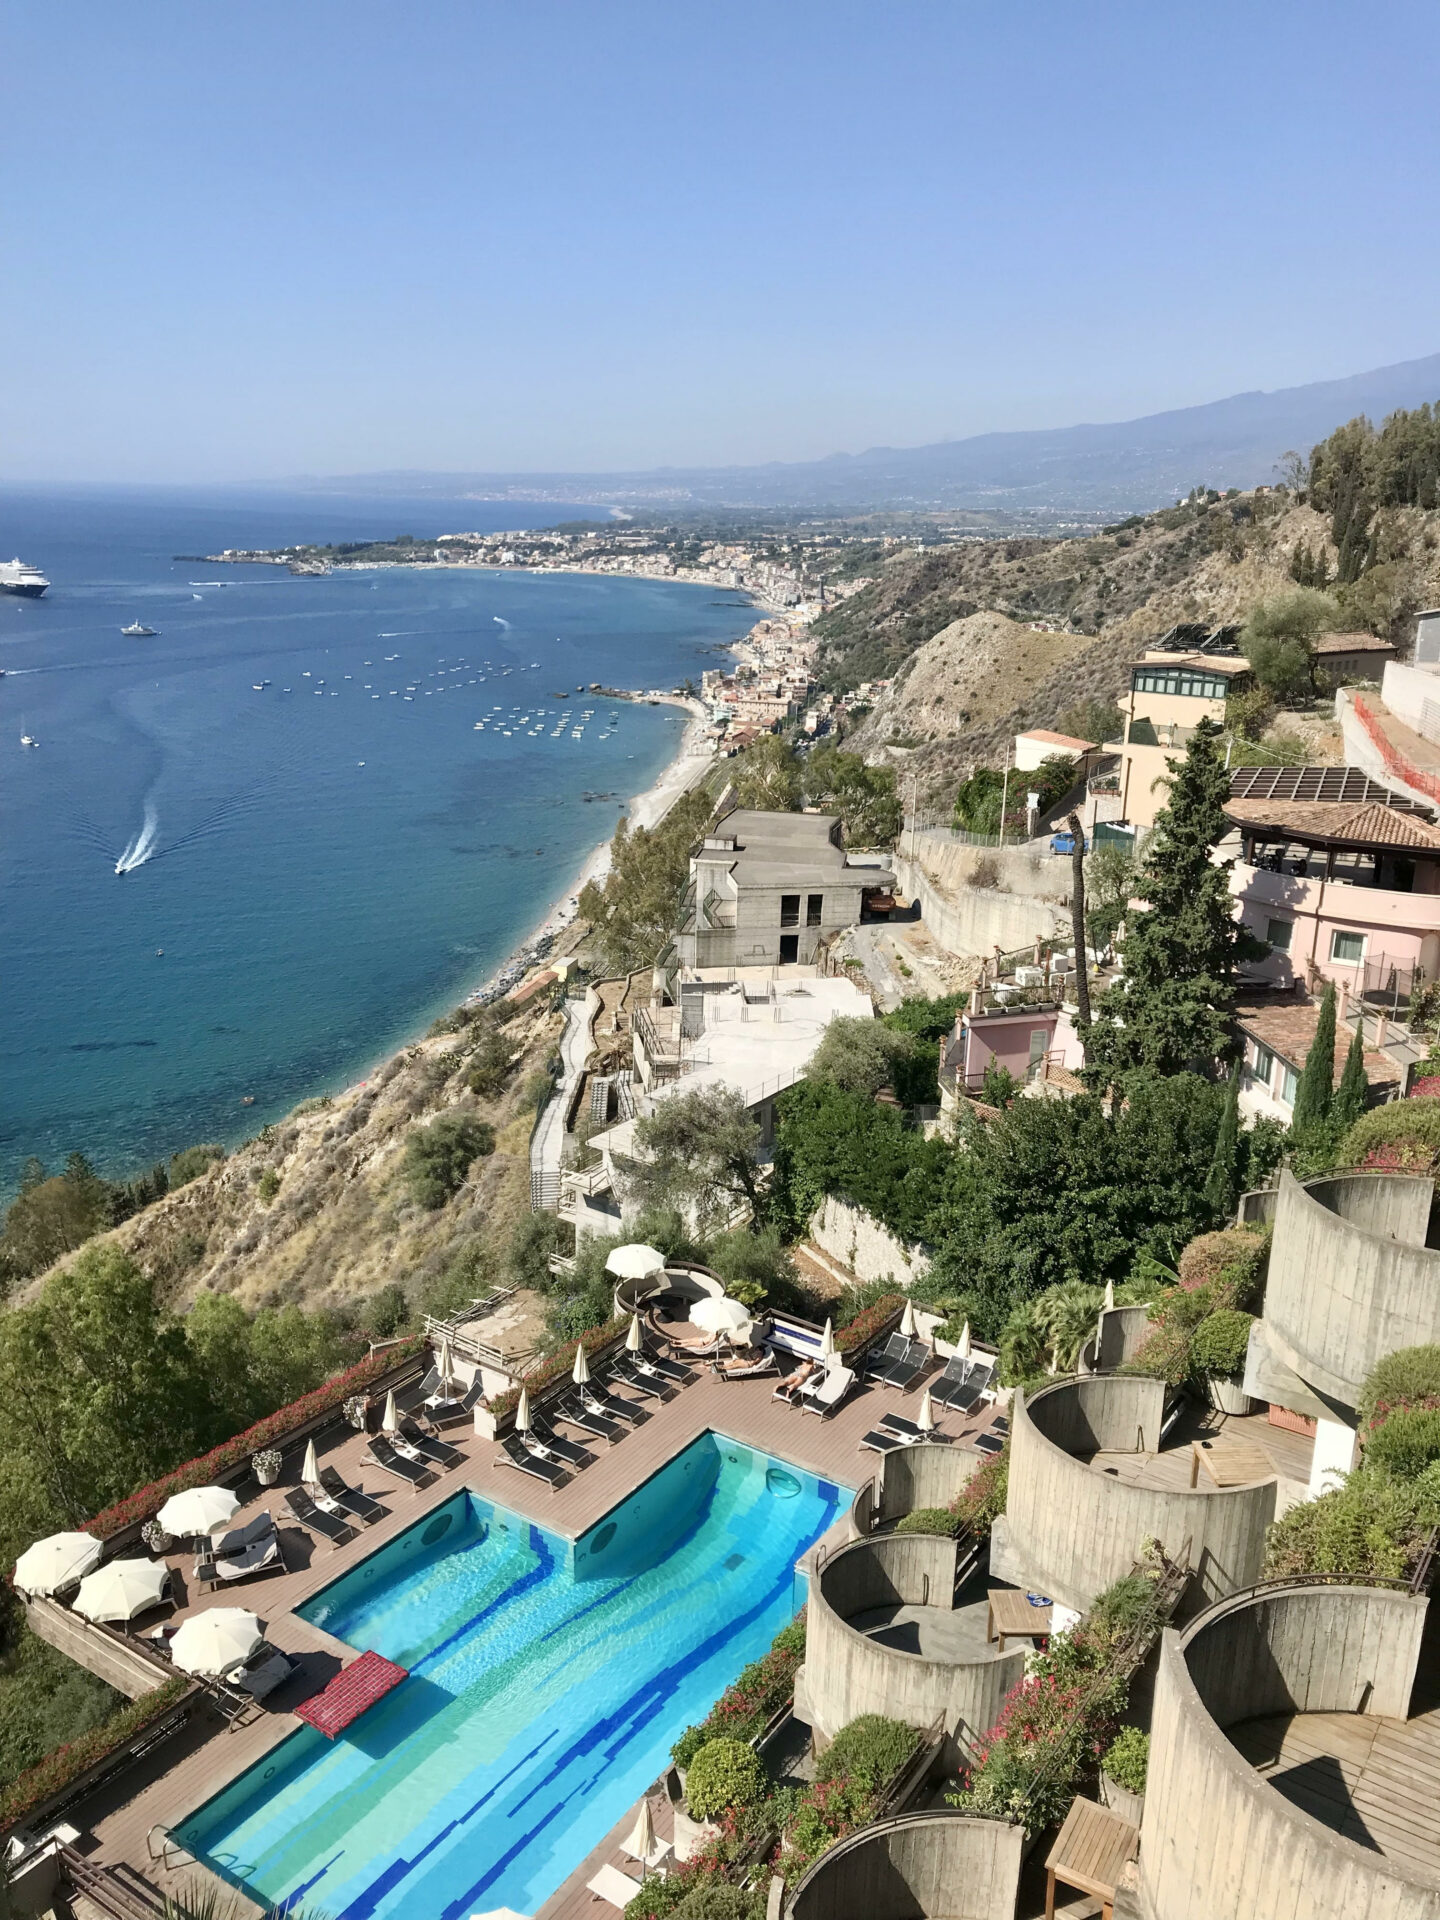 Eurostars Monte Tauro Hotel view